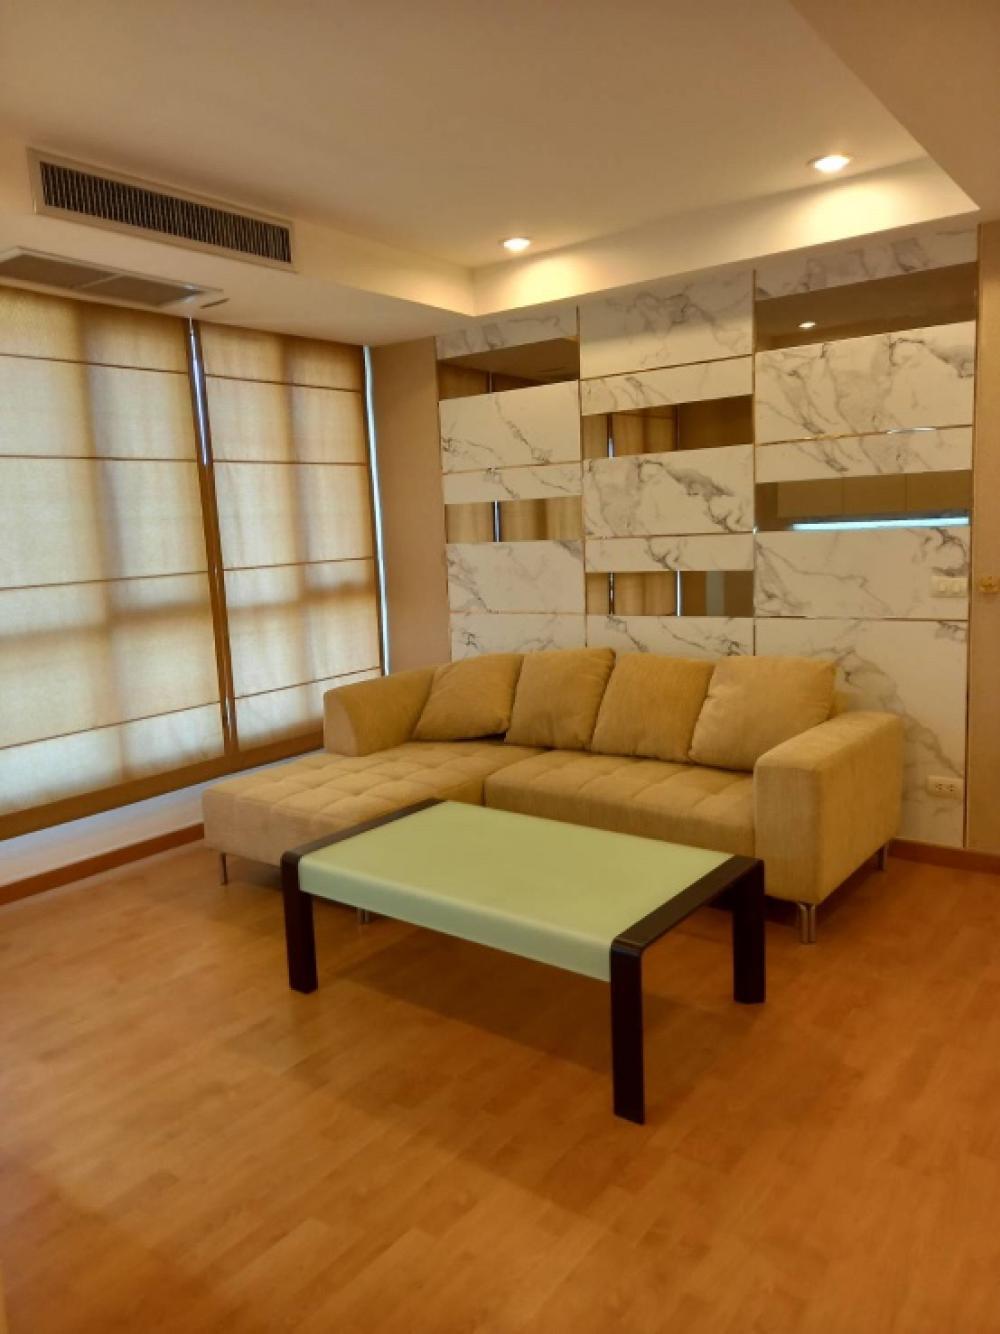 For RentCondoRamkhamhaeng, Hua Mak : ***New Decoration Condo for Rent Near ABAC Ramkamheang 60/90/120 sqm.***